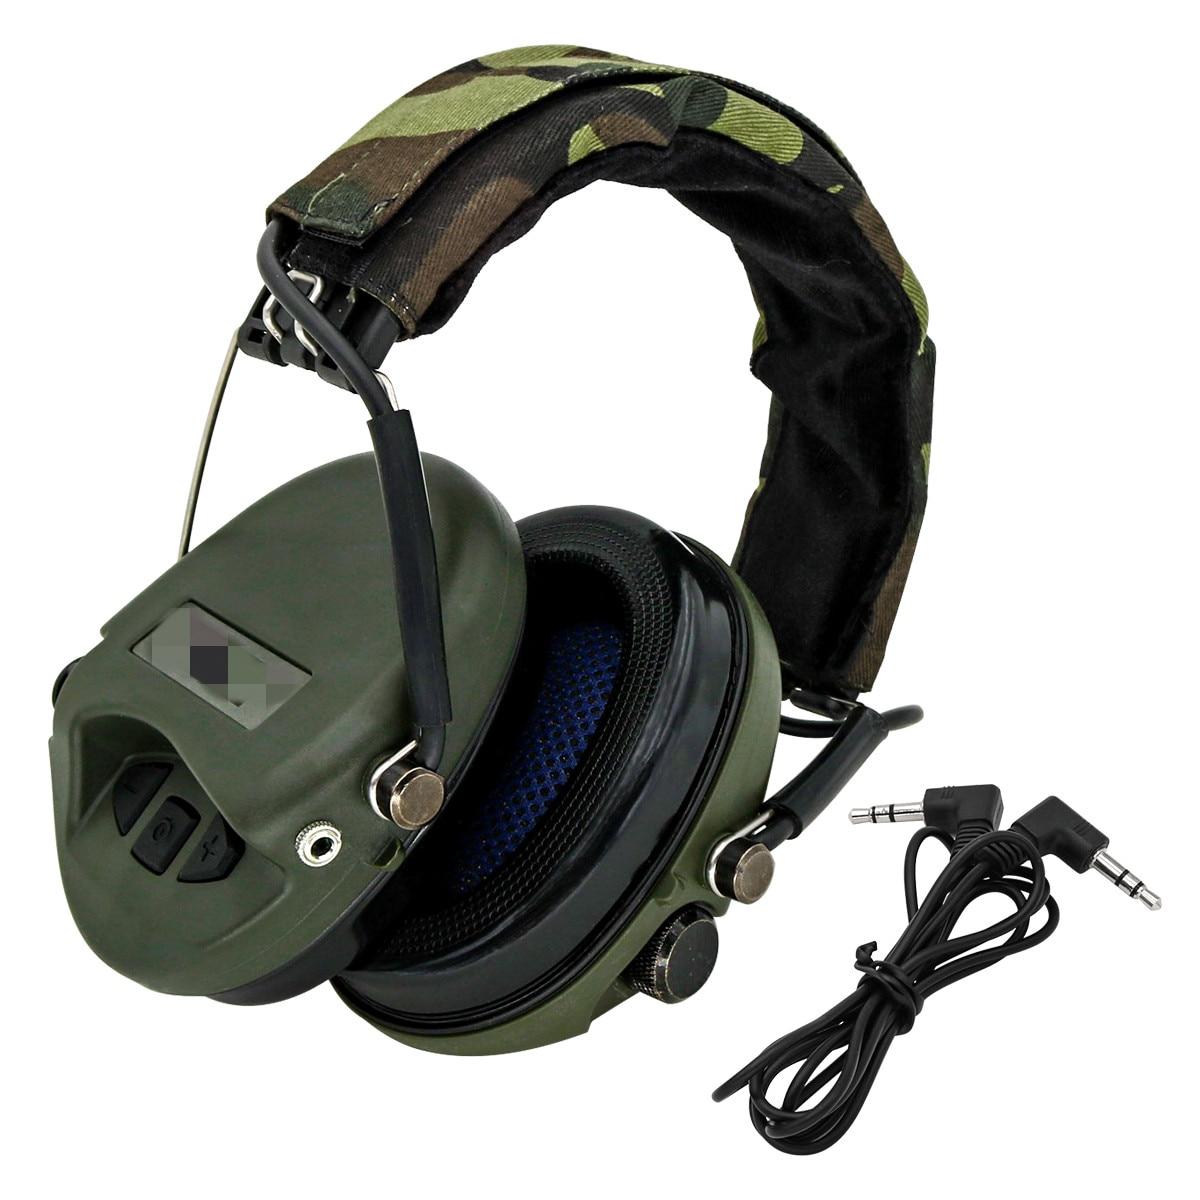 Tactical MSA Sordin Headphones Outdoor Hunting Military Shooting Softair Accessories Peltor Noise CancellingTactical Headphones